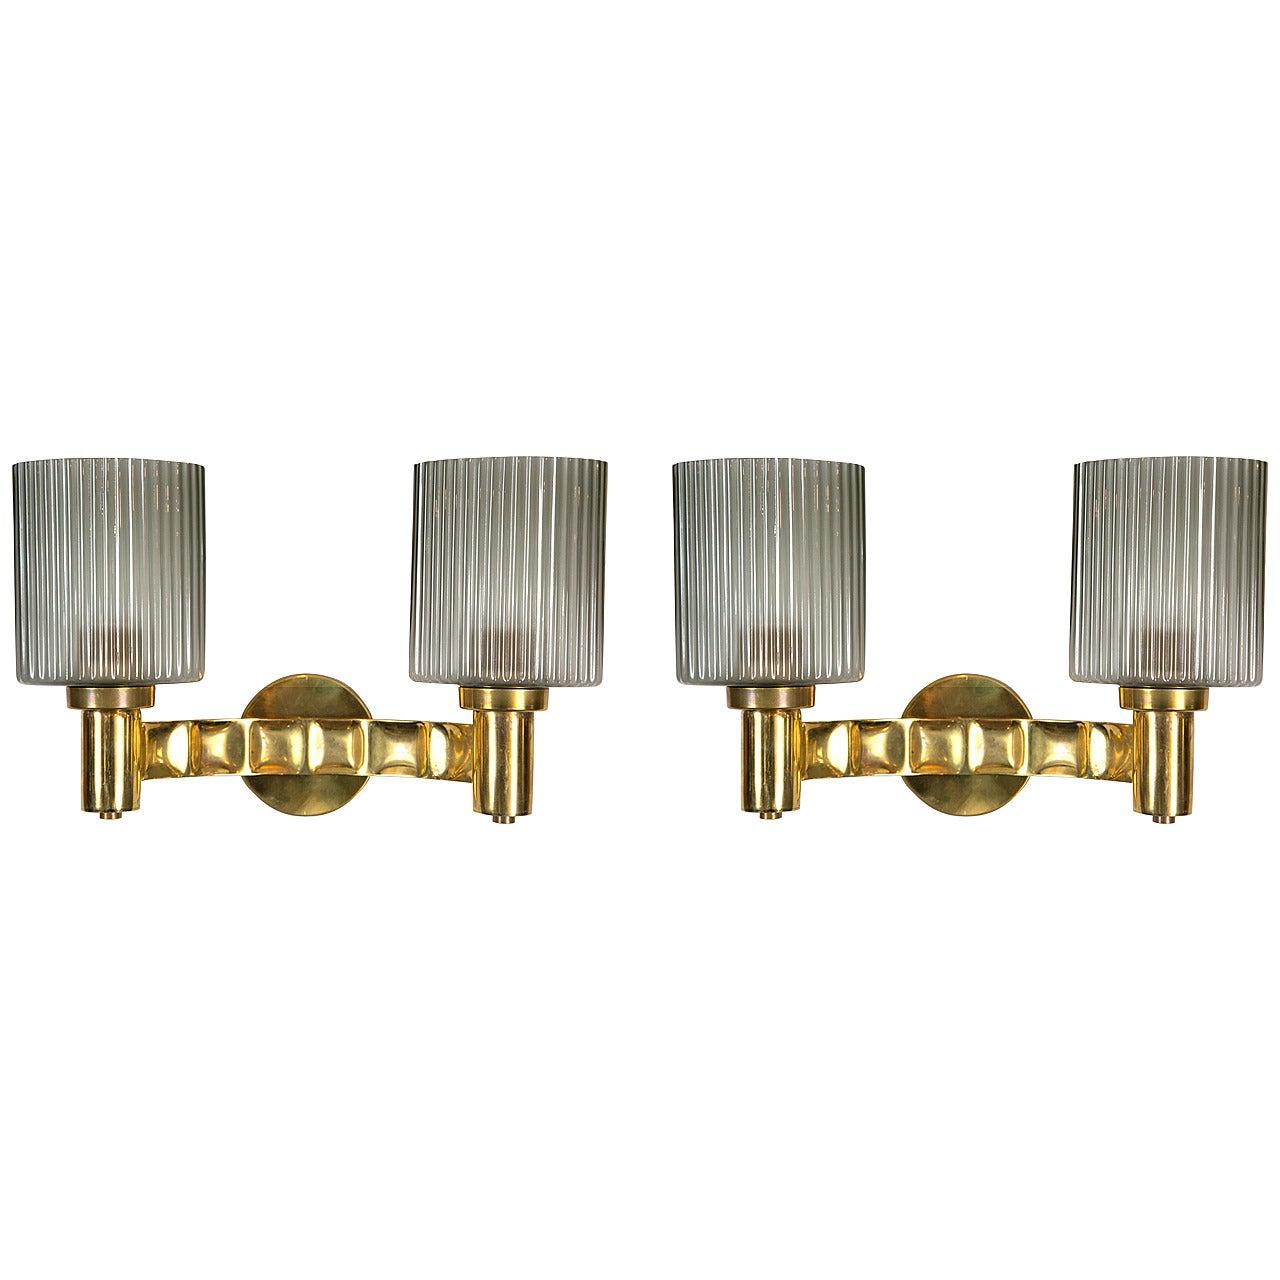 Pair of Murano Brass Wall Lights